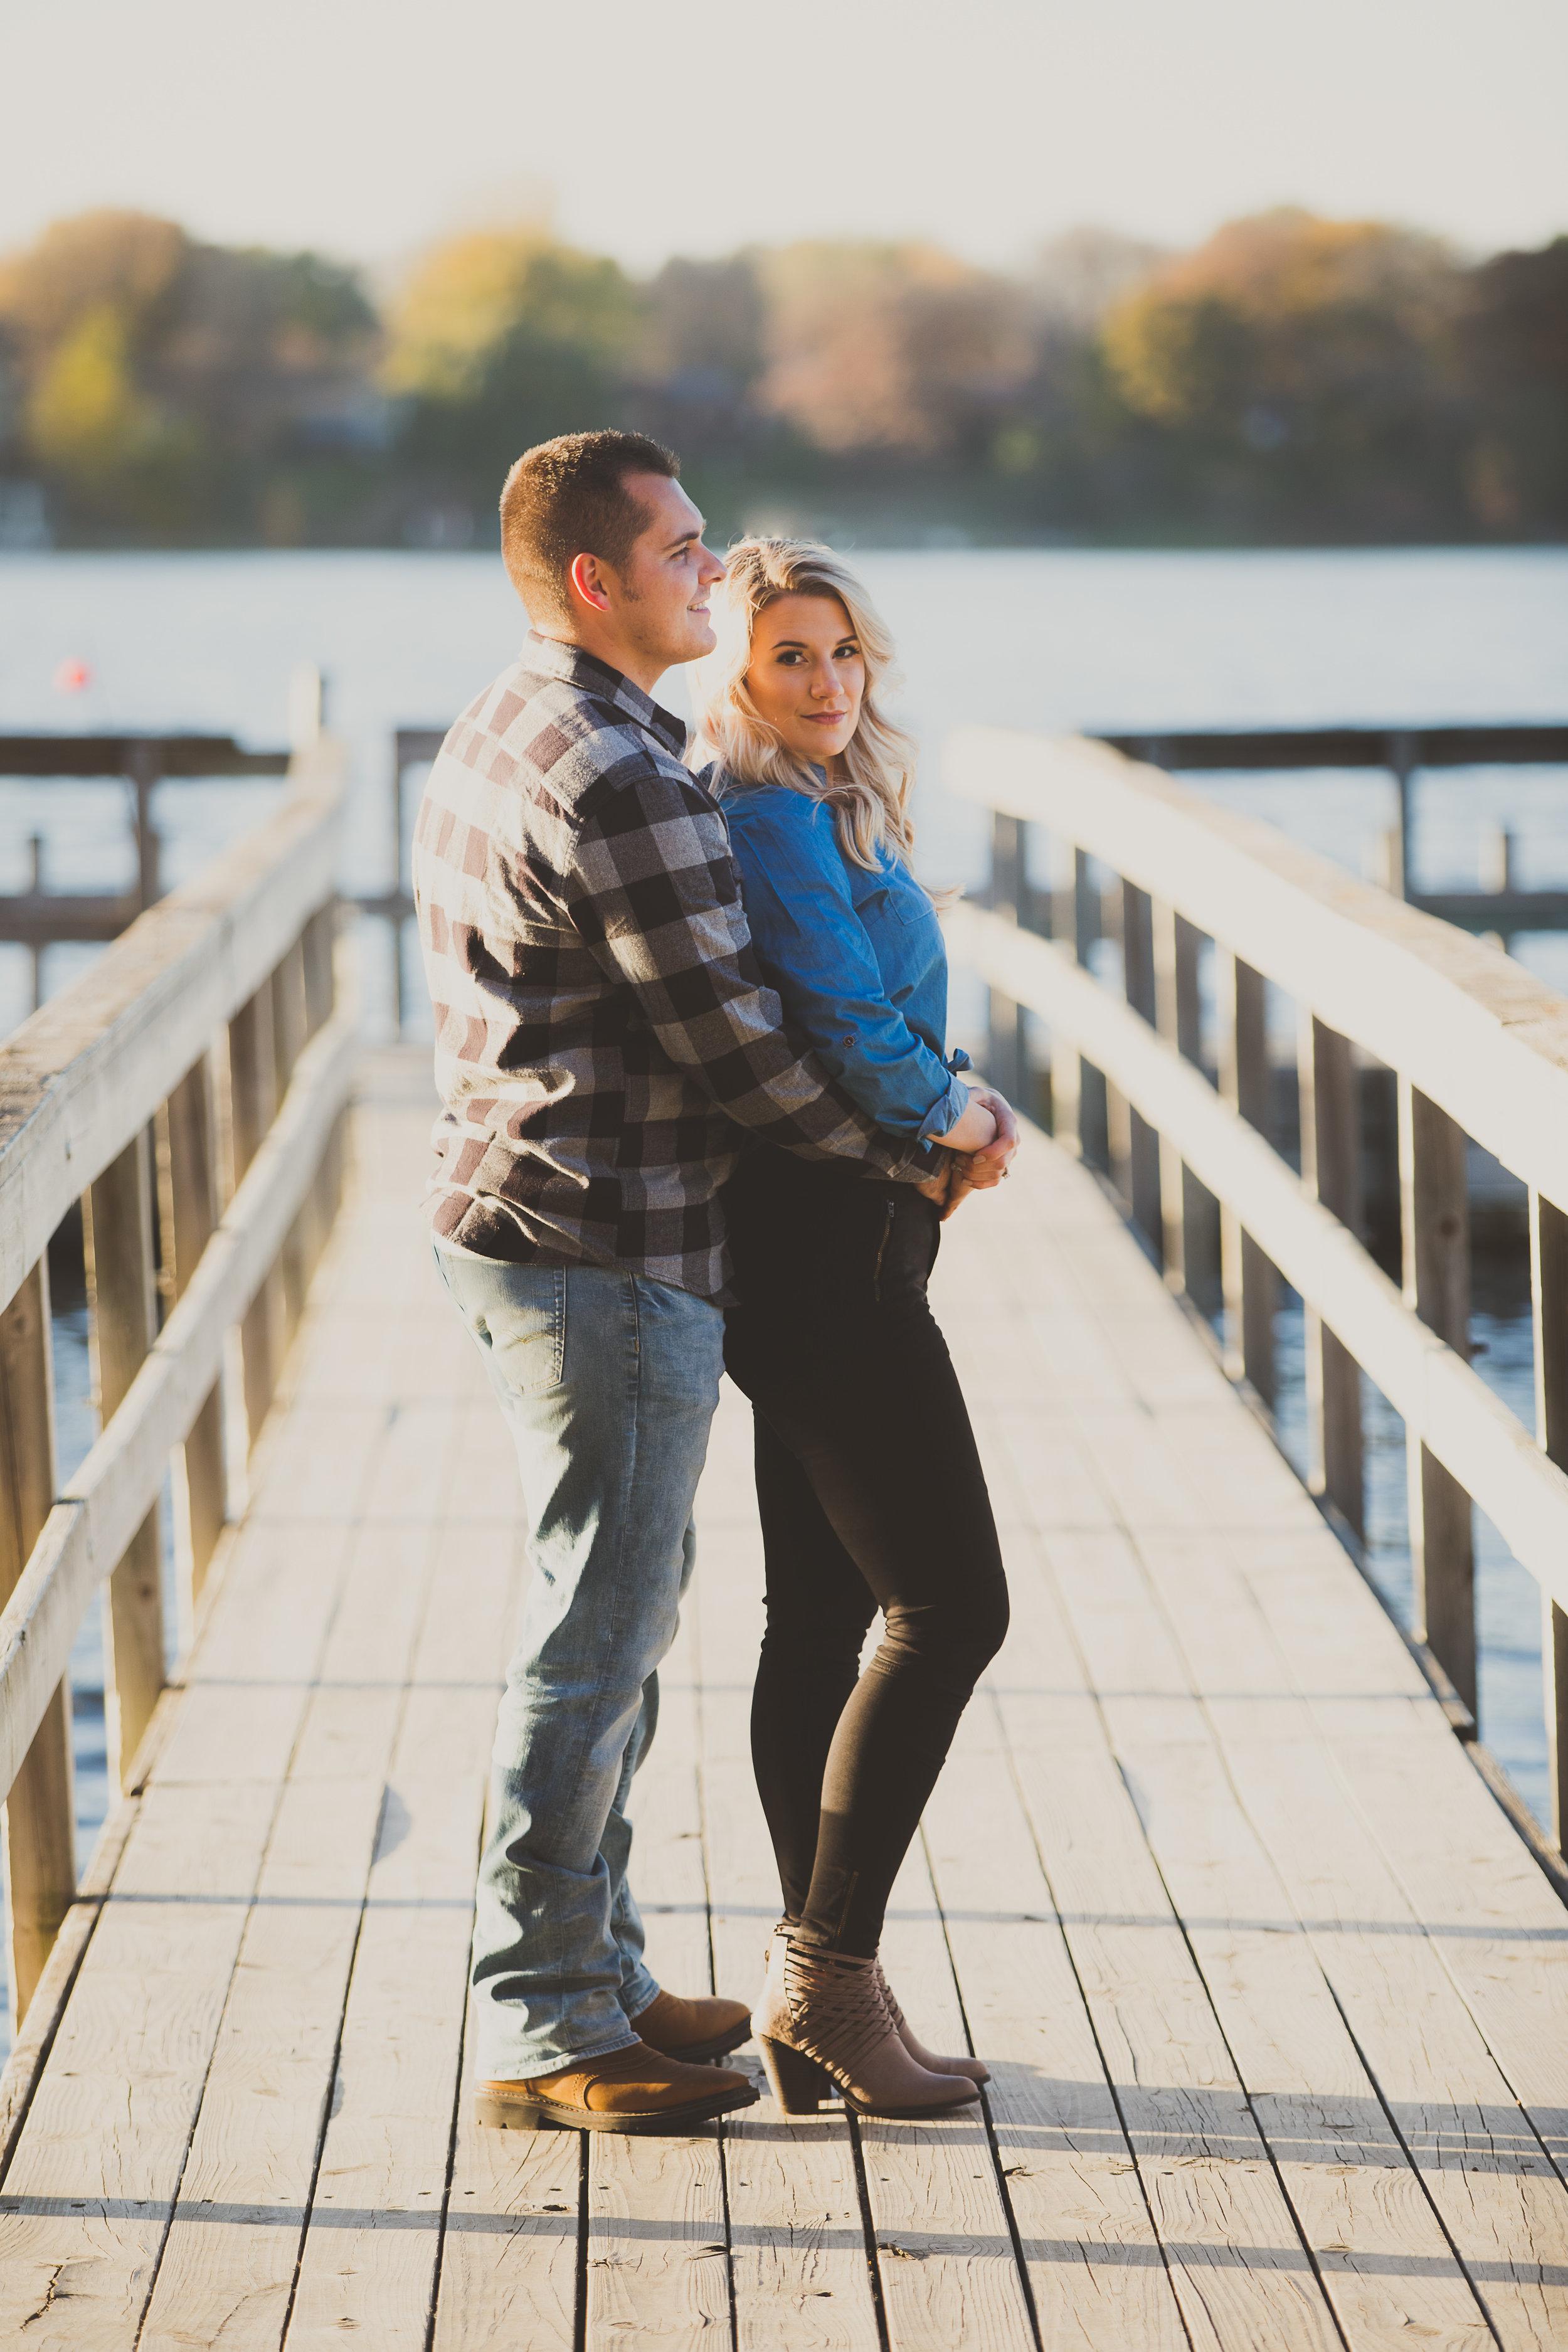 20181021_Derek&Neasha_Engagement-11.jpg